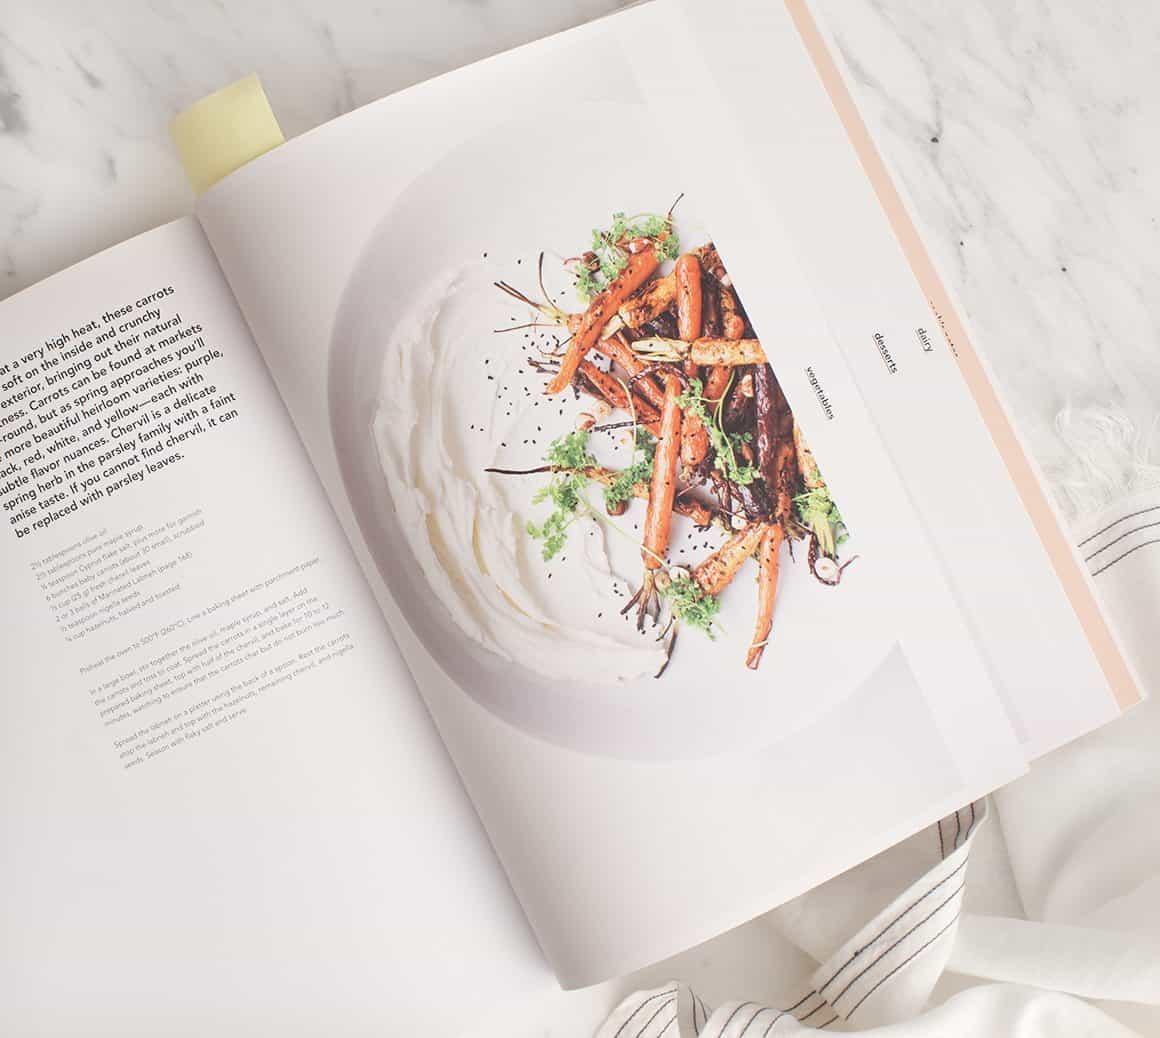 cookbooks Archives - Love and Lemons